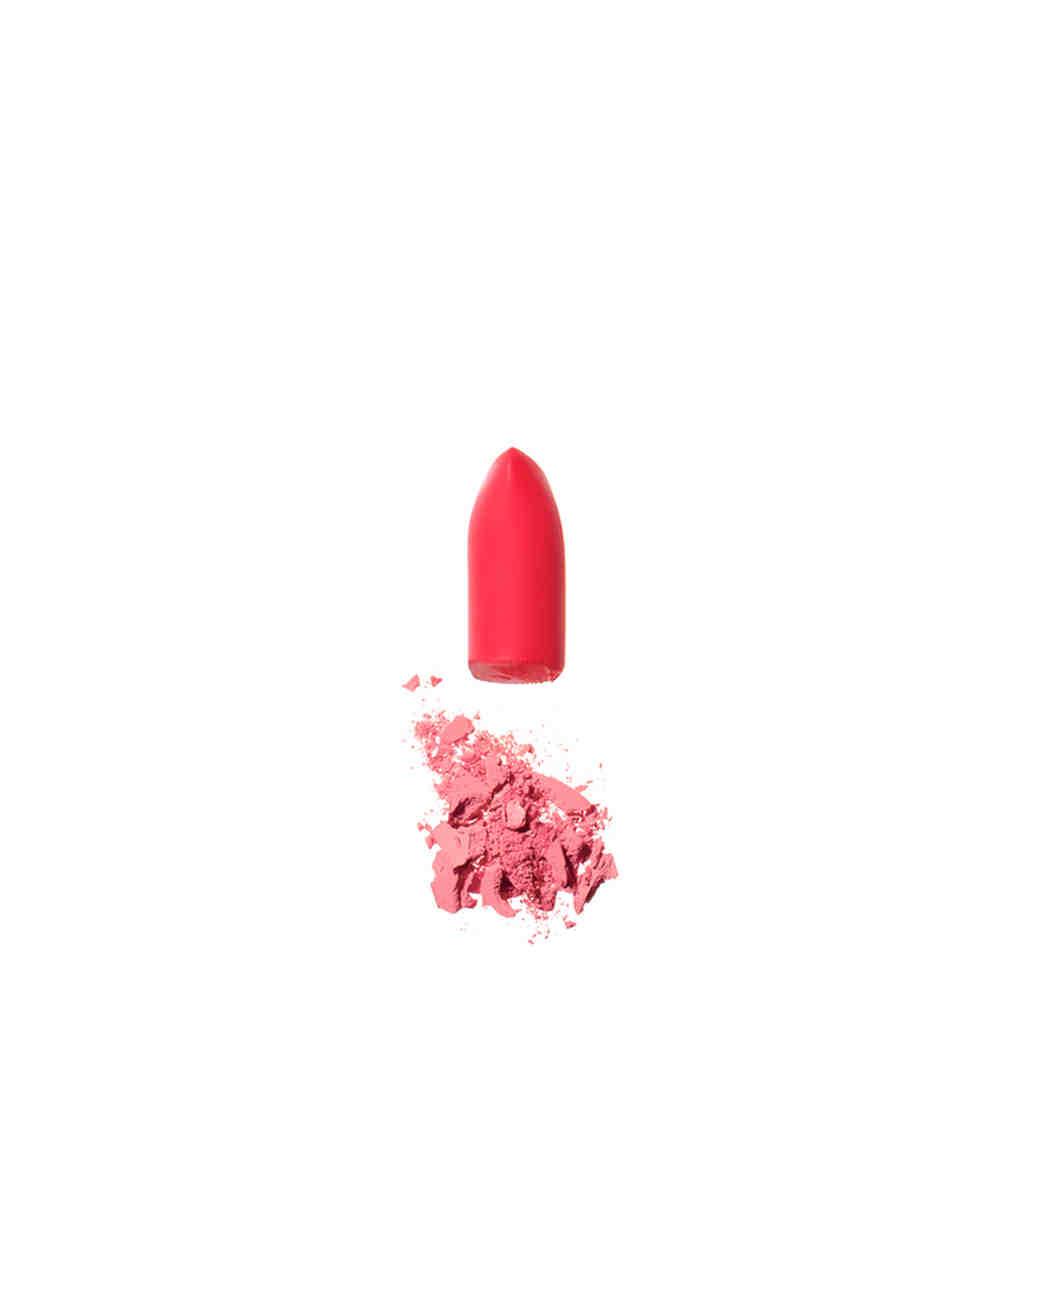 makeup-bold-light-mwd108909.jpg